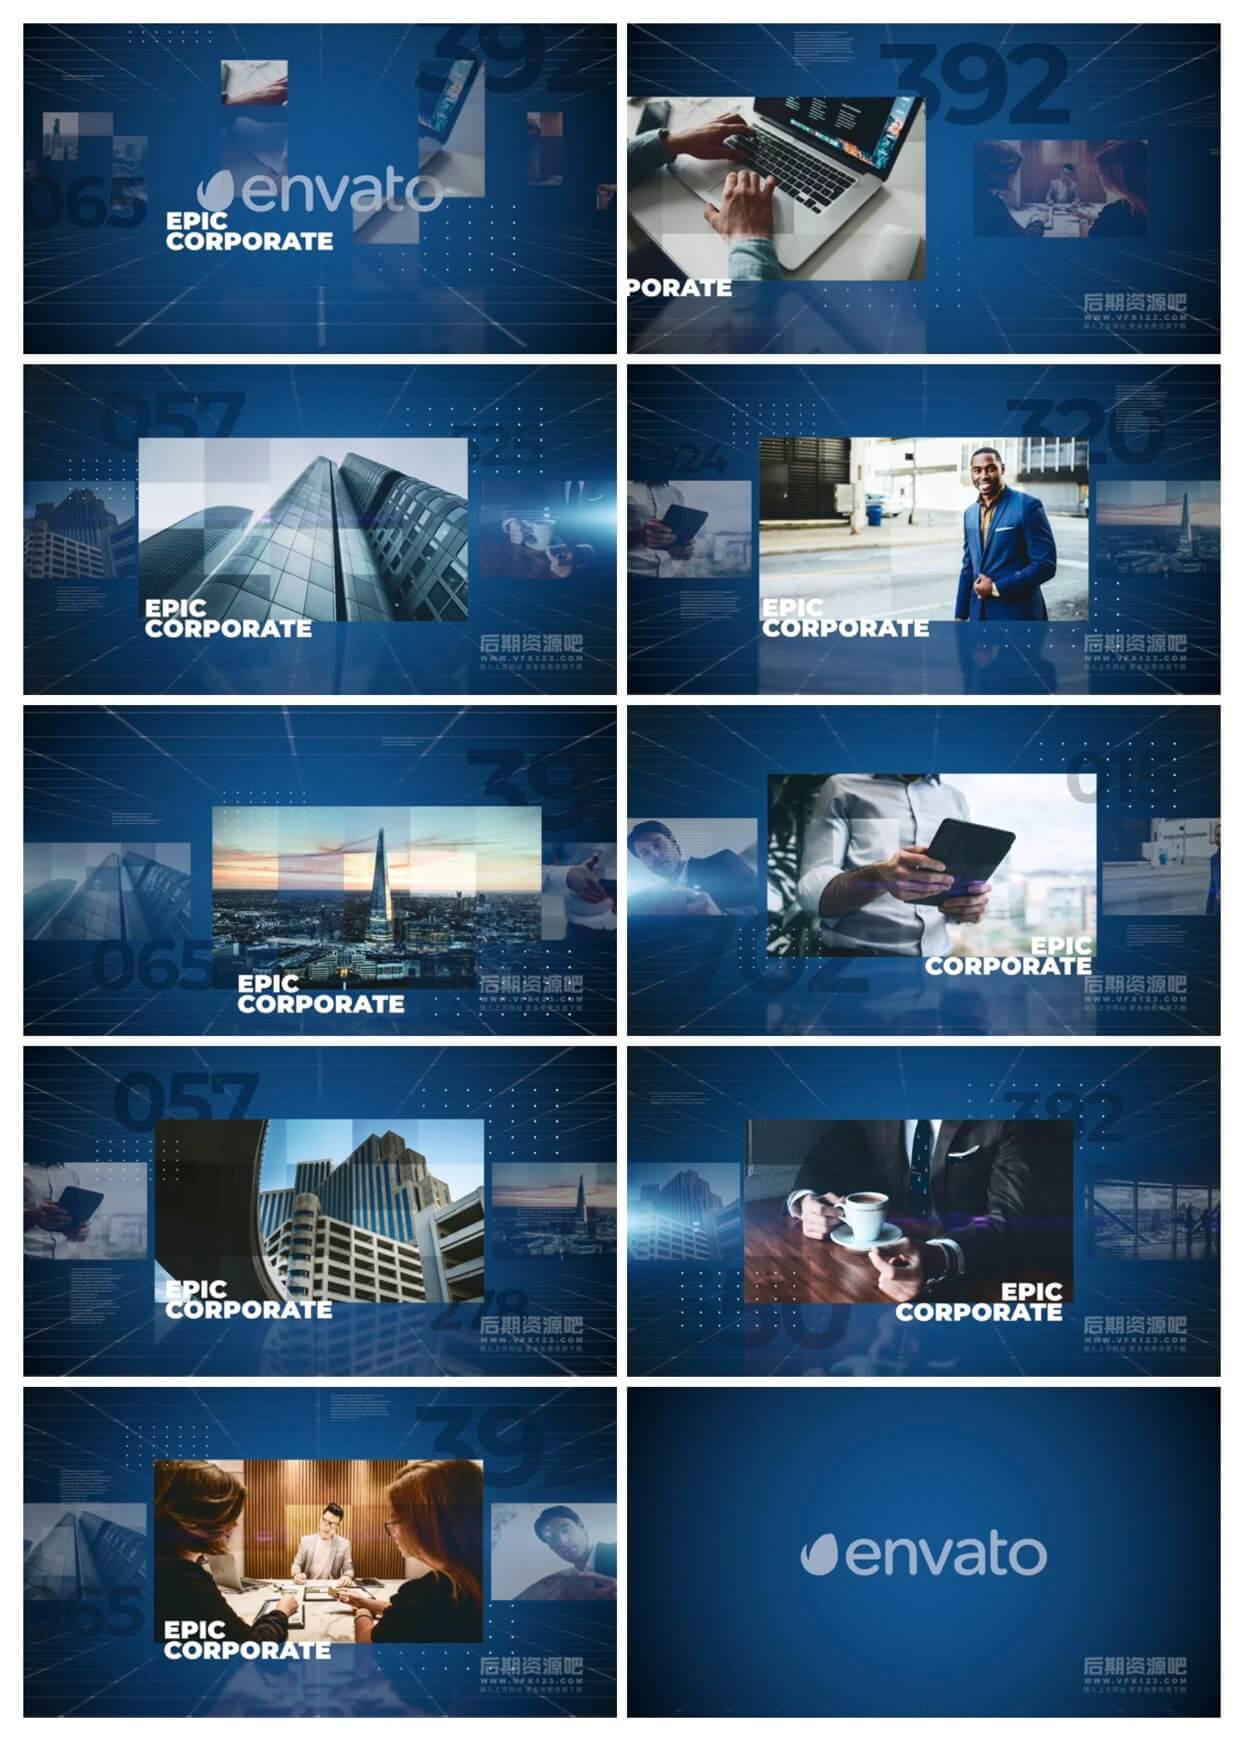 fcpx插件 史诗级公司企业宣传片介绍主题模板 Epic Corporate